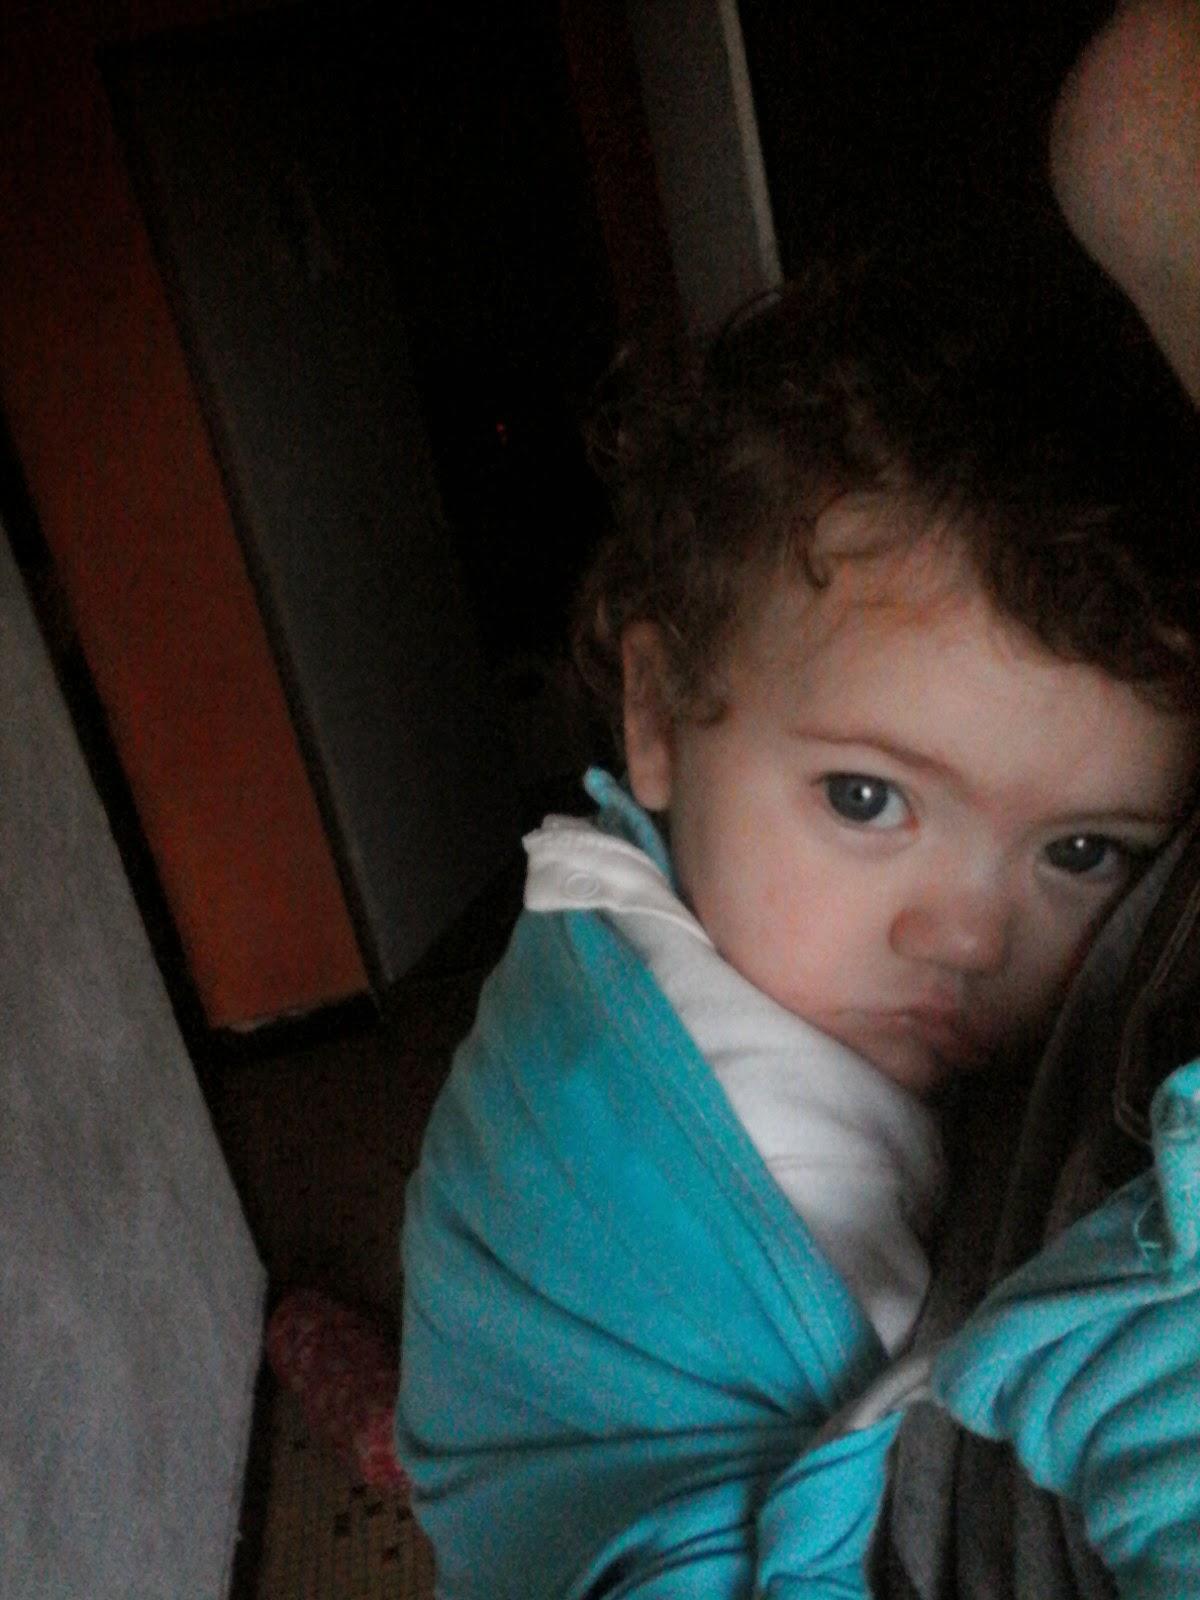 portage bébé BB RGO reflux babywearing malade sling colimaçon